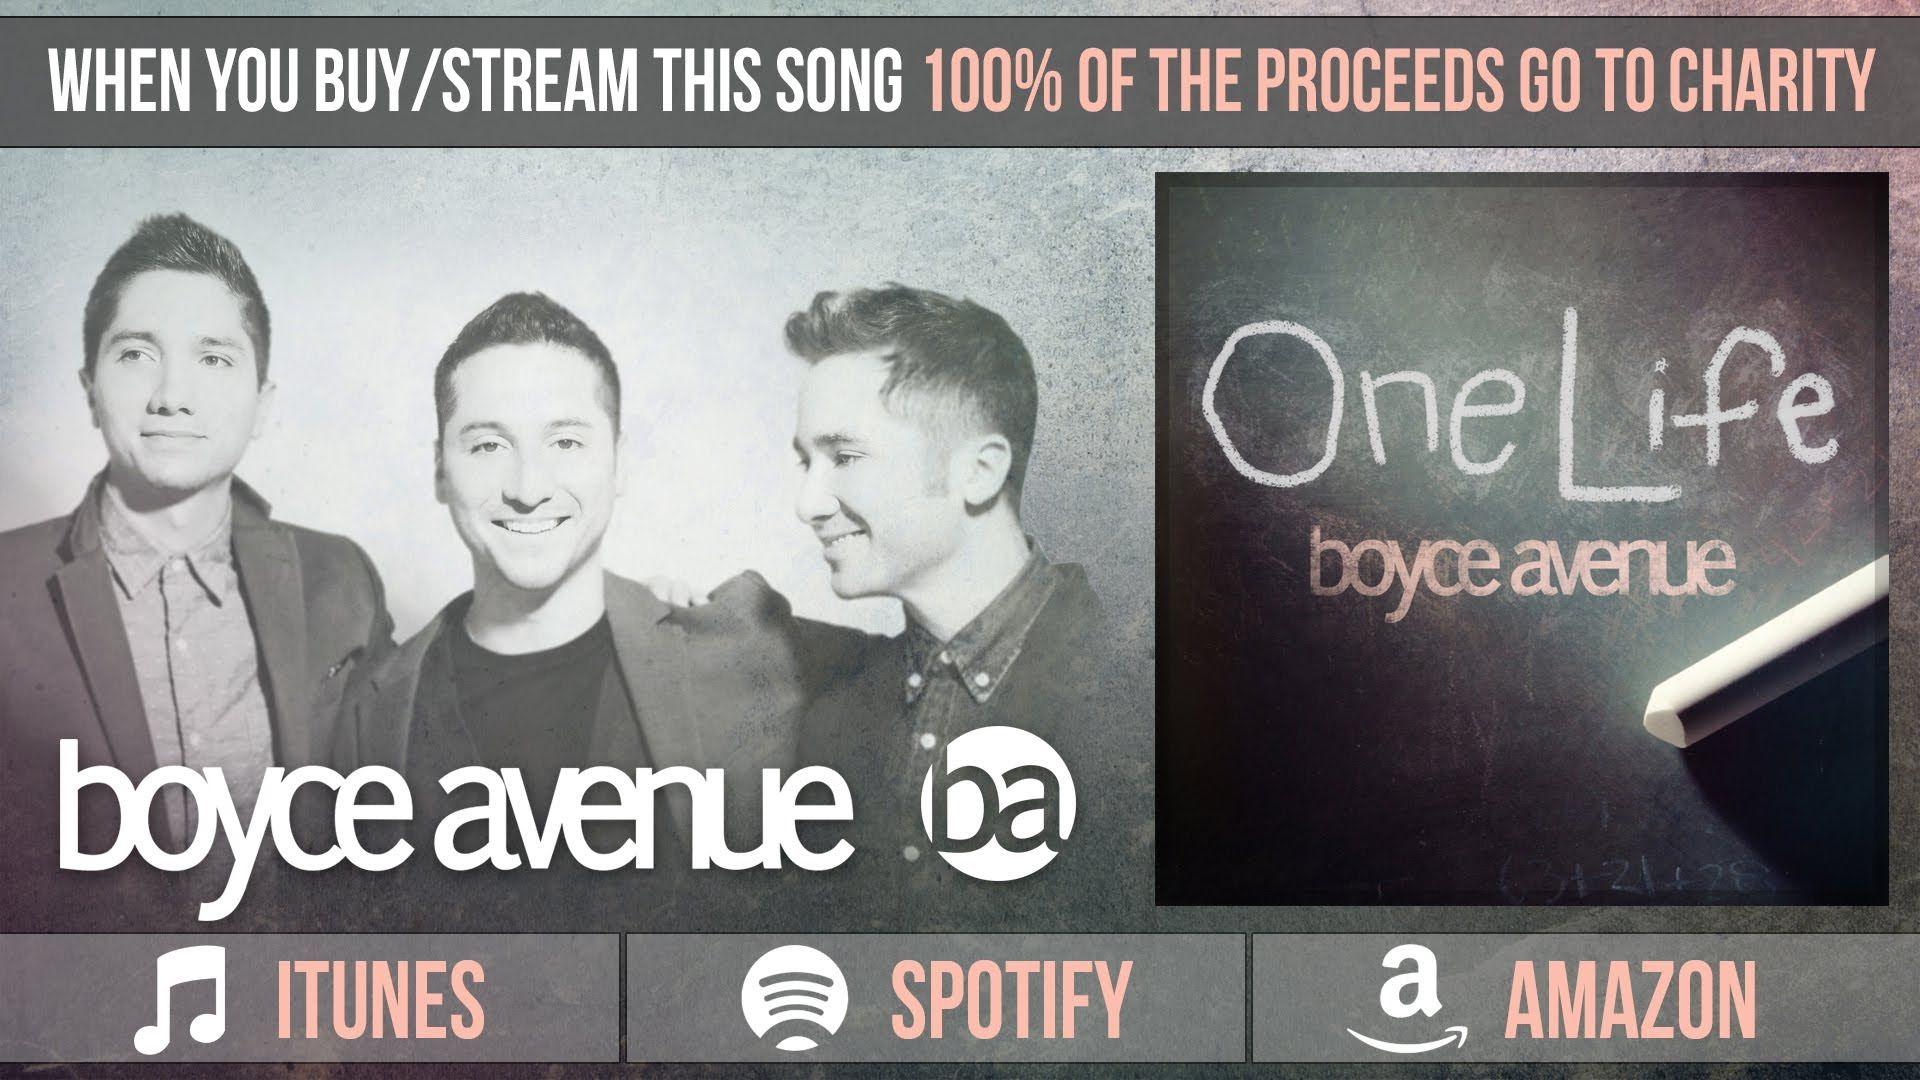 Boyce Avenue One Life (Audio)(Charity Single) on iTunes